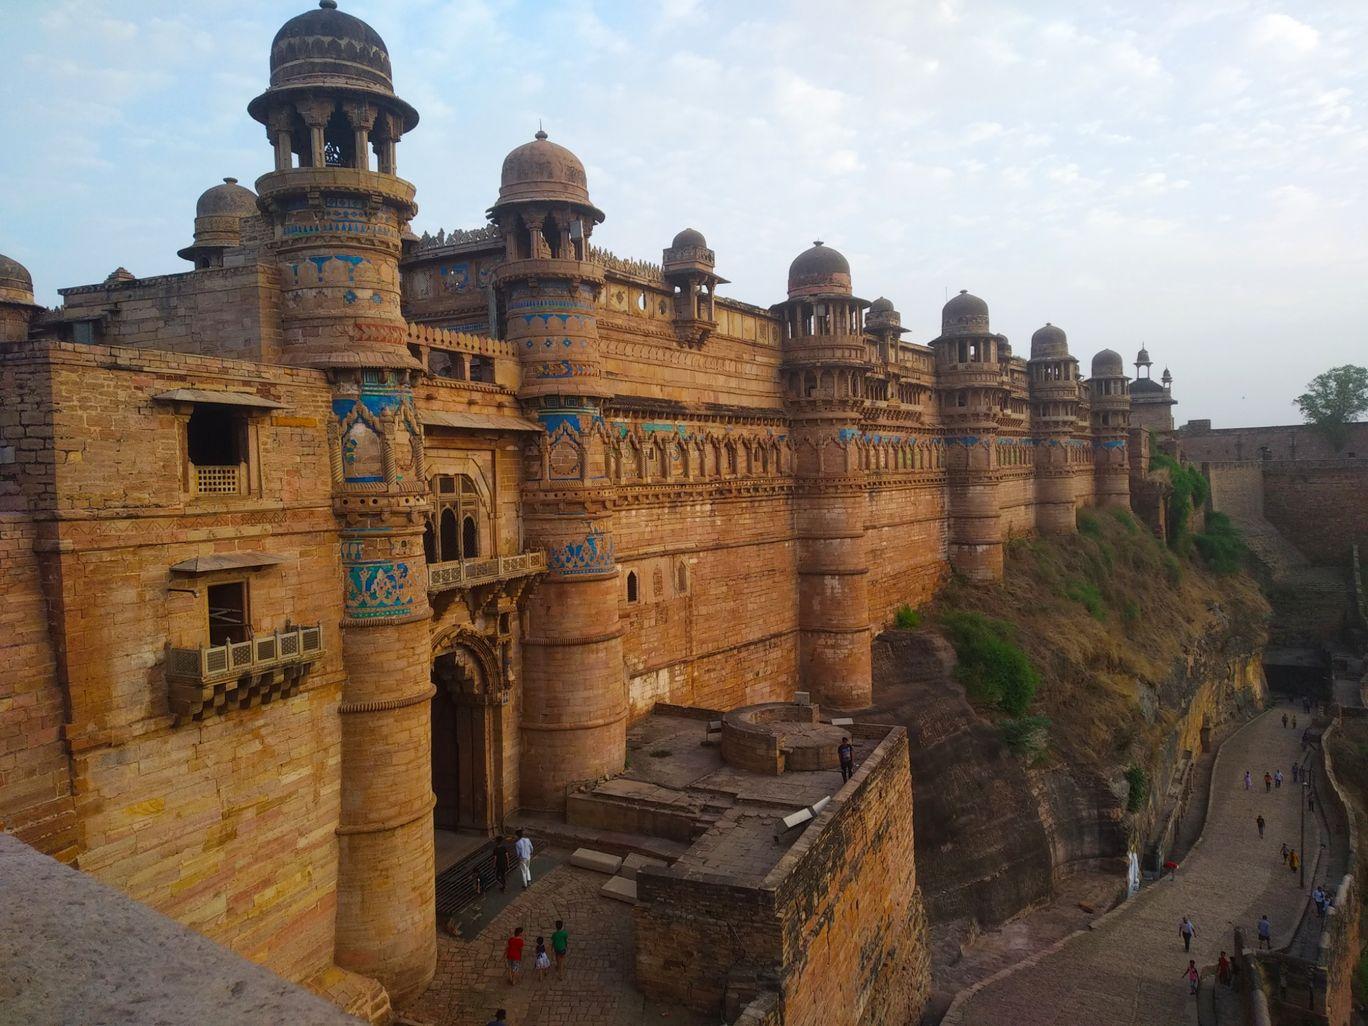 Photo of Gwalior Fort By Ayushi Shrivastava